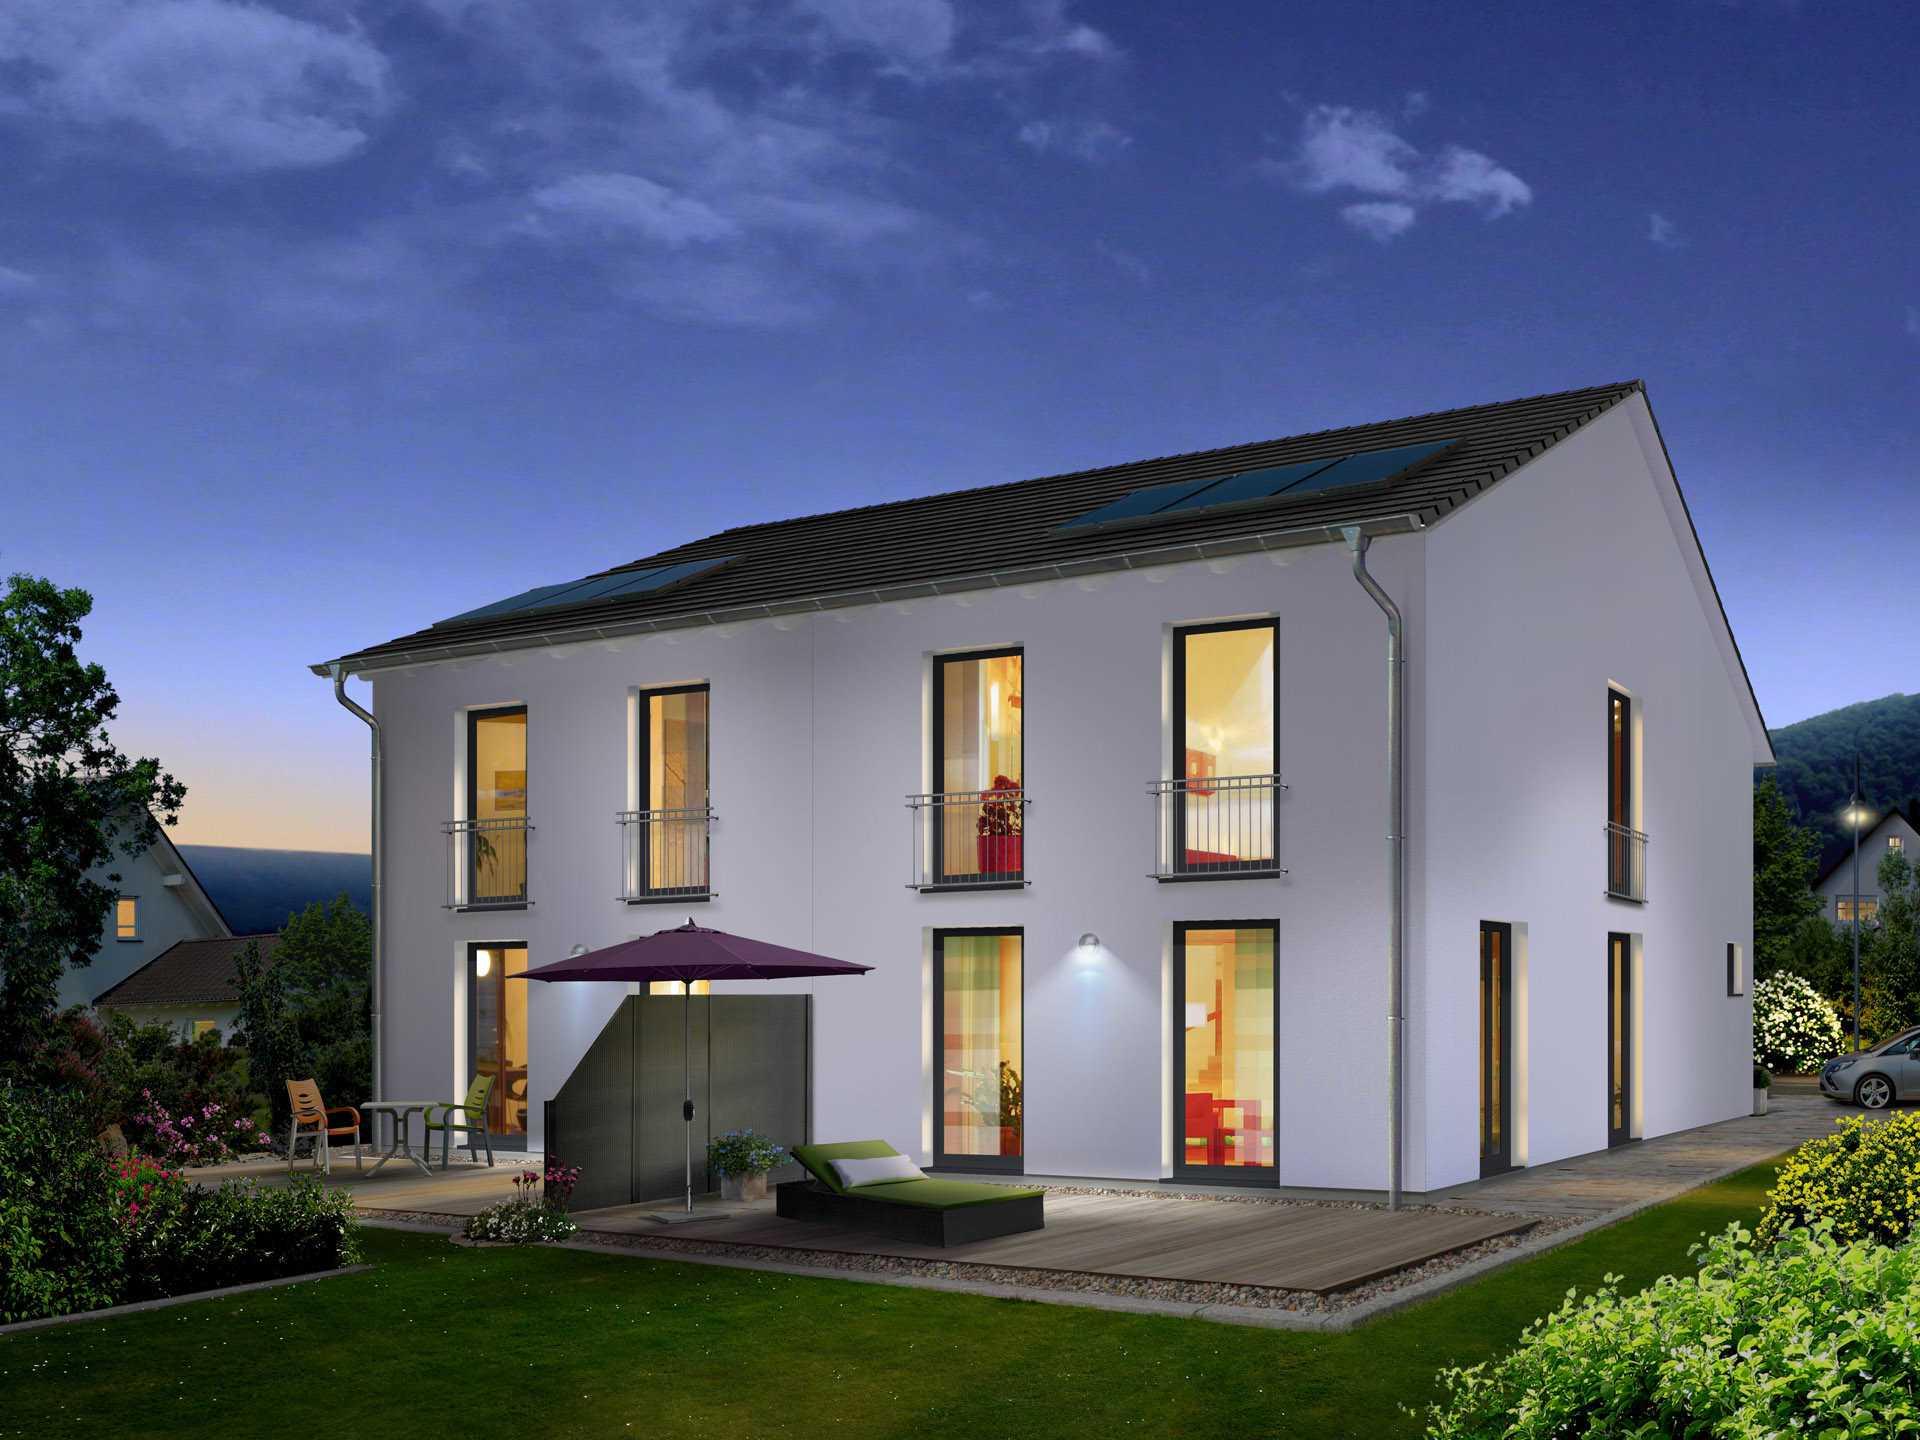 doppelhaus aura 125 town country haus lizenzgeber. Black Bedroom Furniture Sets. Home Design Ideas